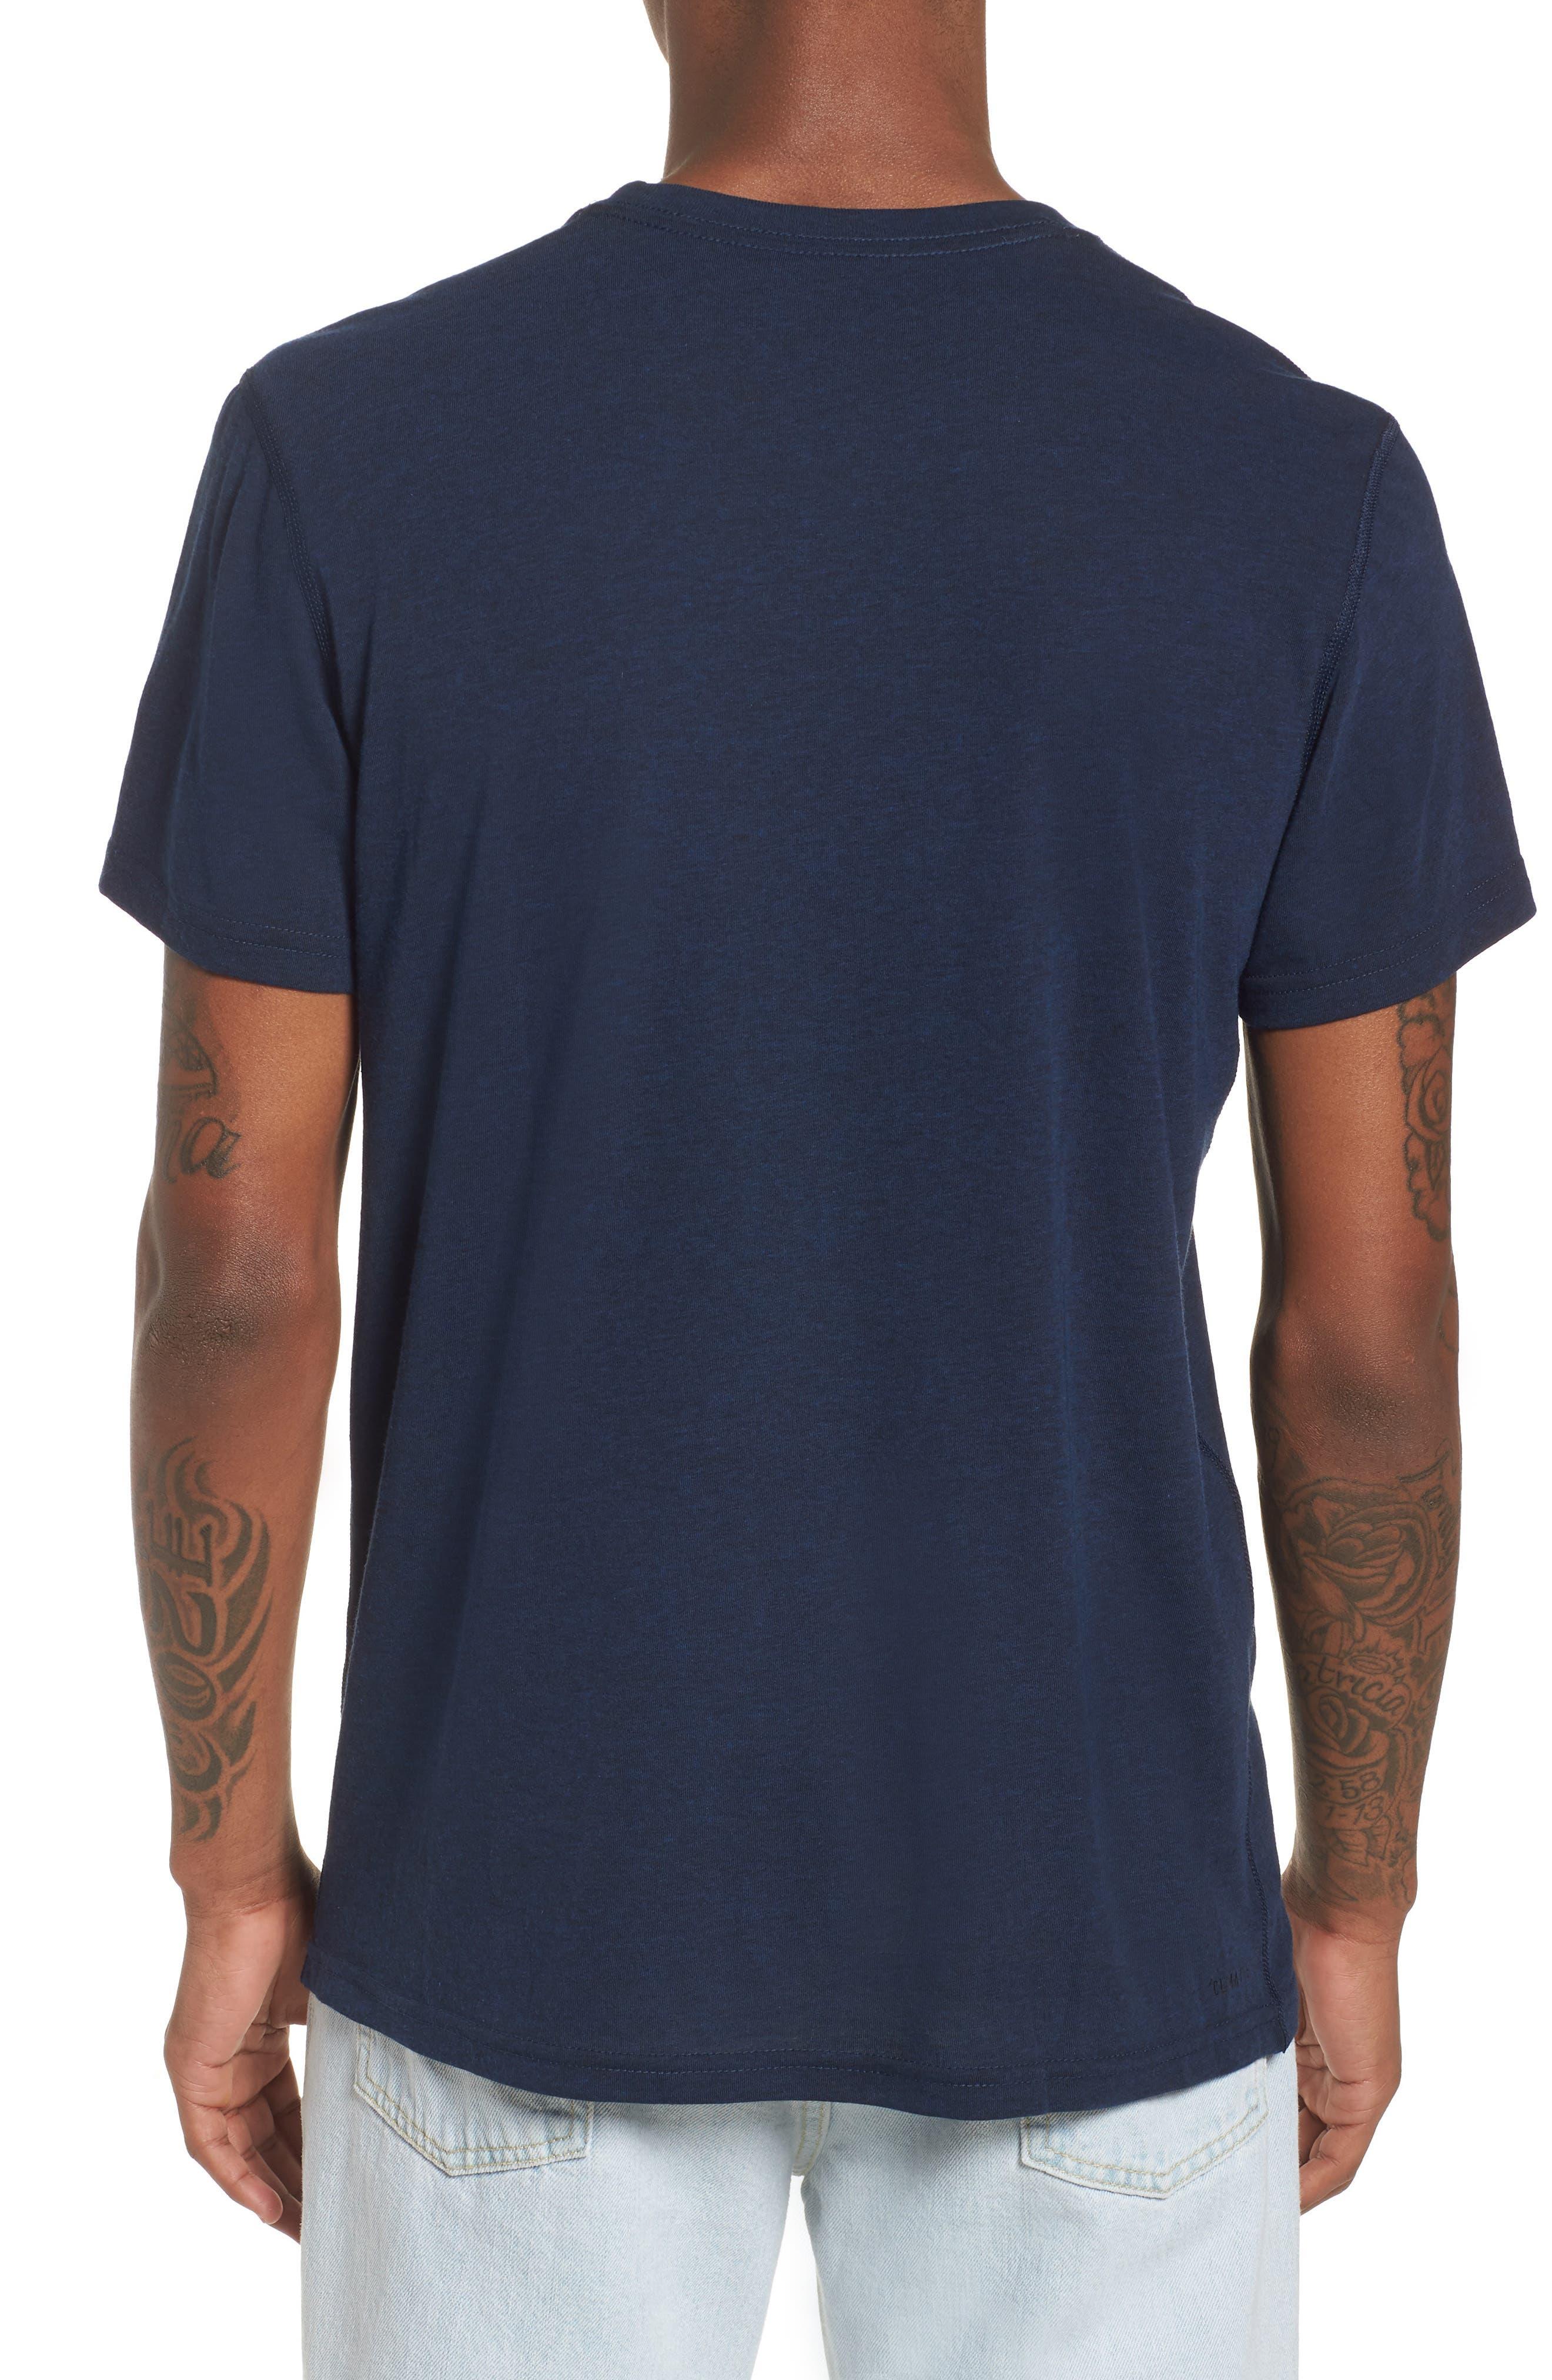 Ult Crewneck T-Shirt,                             Alternate thumbnail 2, color,                             002